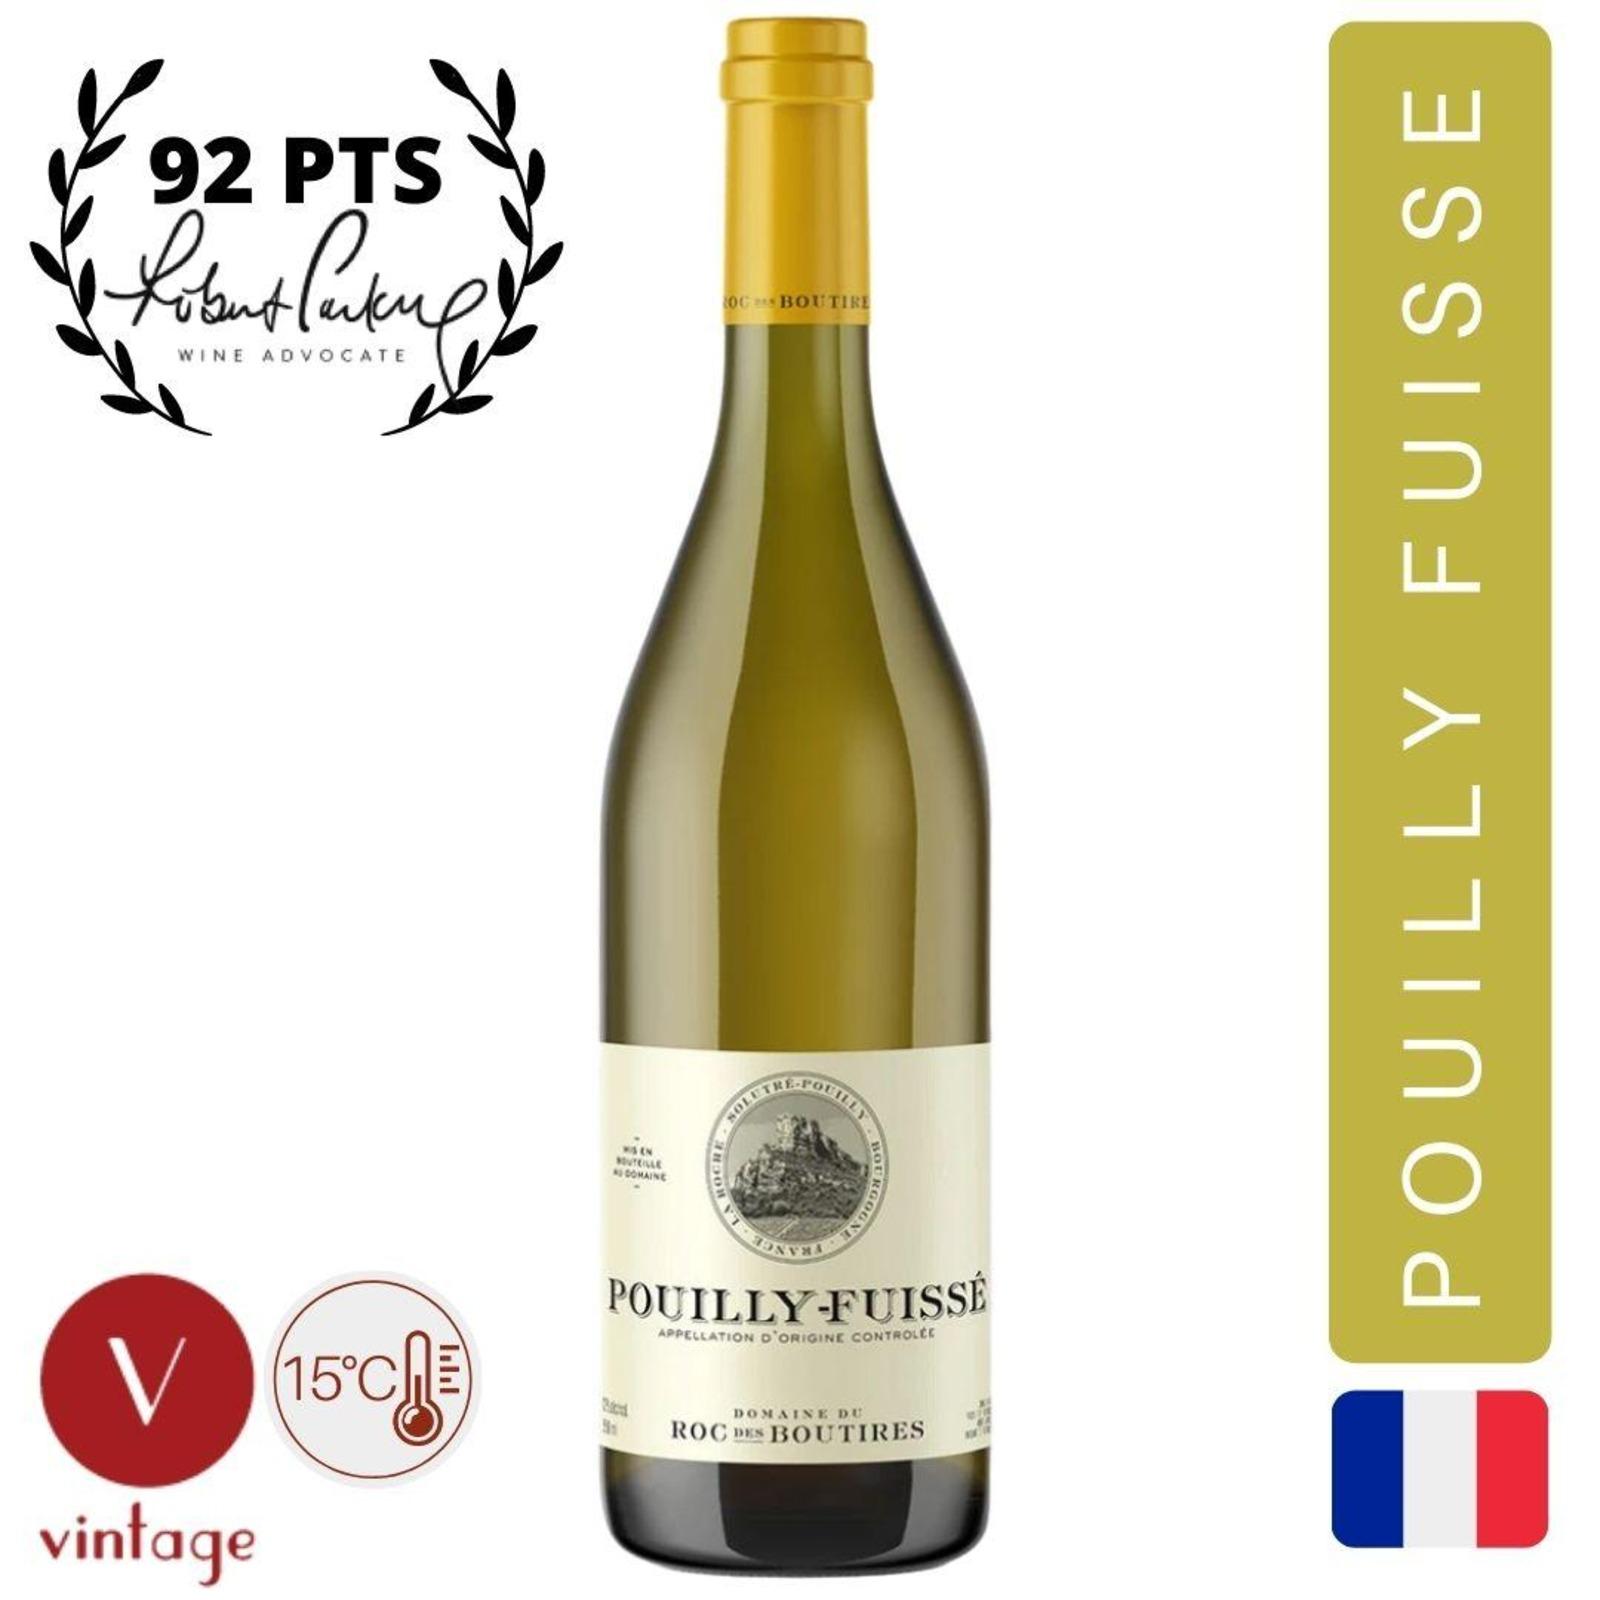 Roc des Boutires - Pouilly Fuisse - White Wine